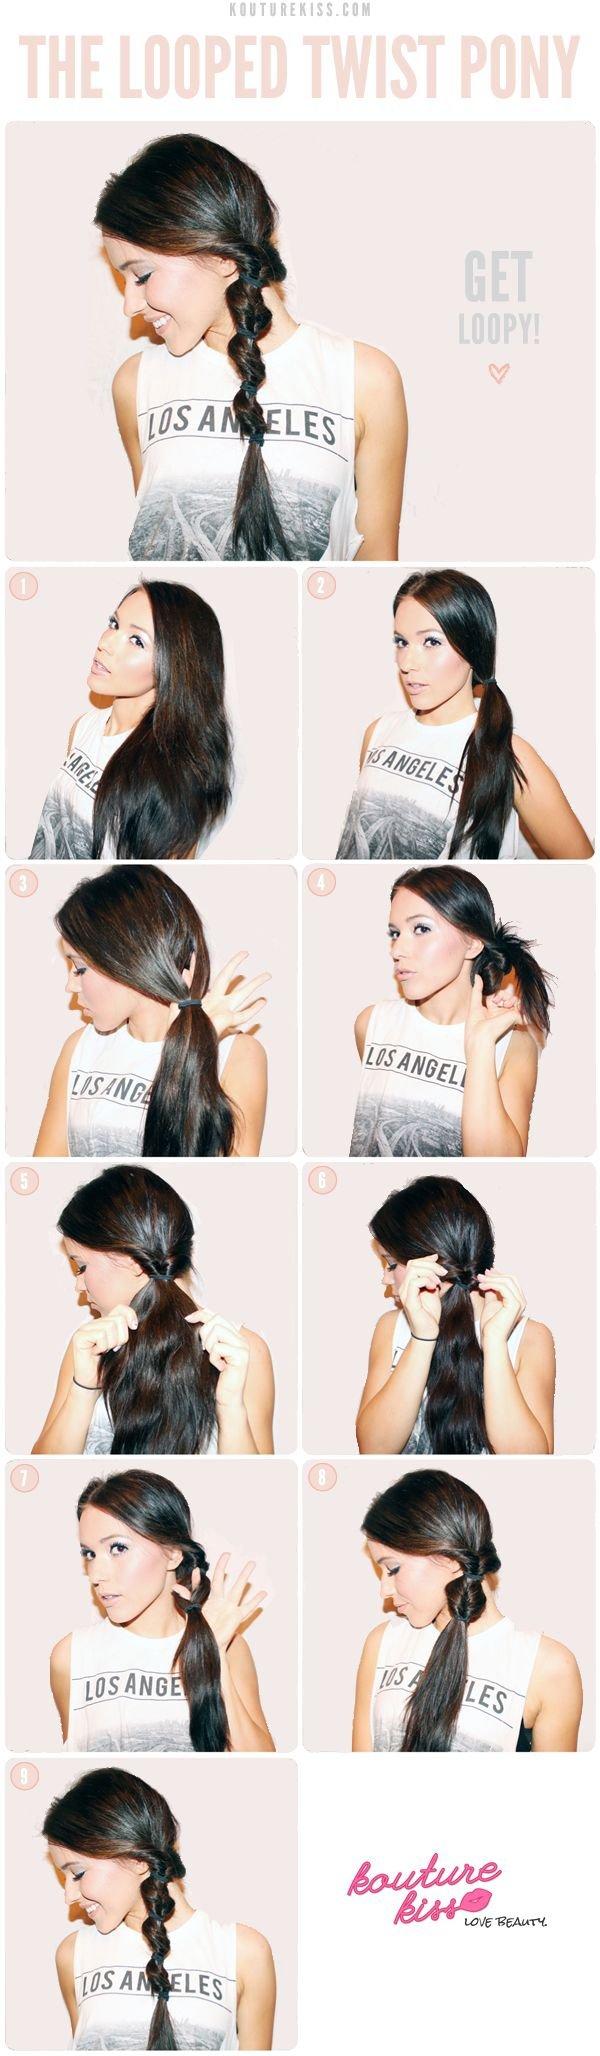 face,beauty,eyelash,hairstyle,head,